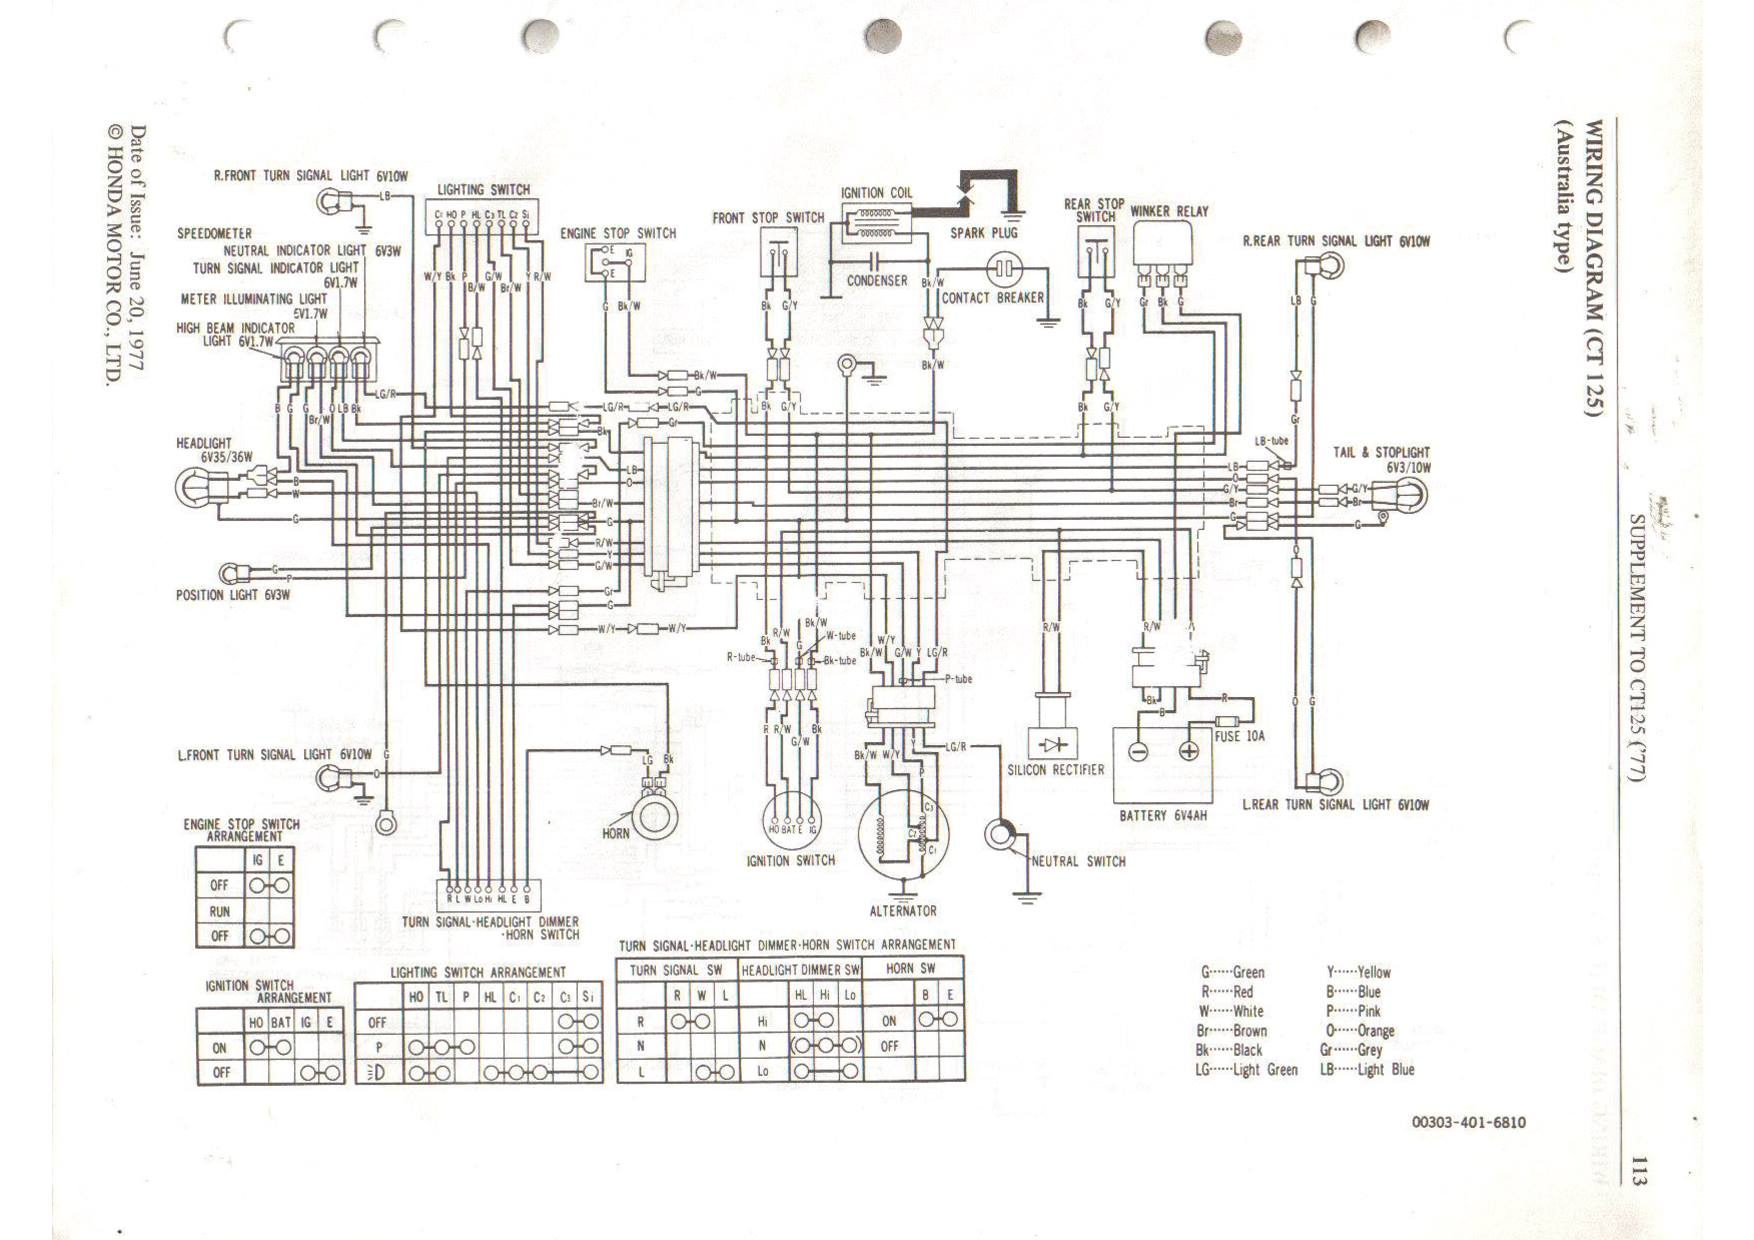 1980 Kz1000 Ltd Wiring Diagram